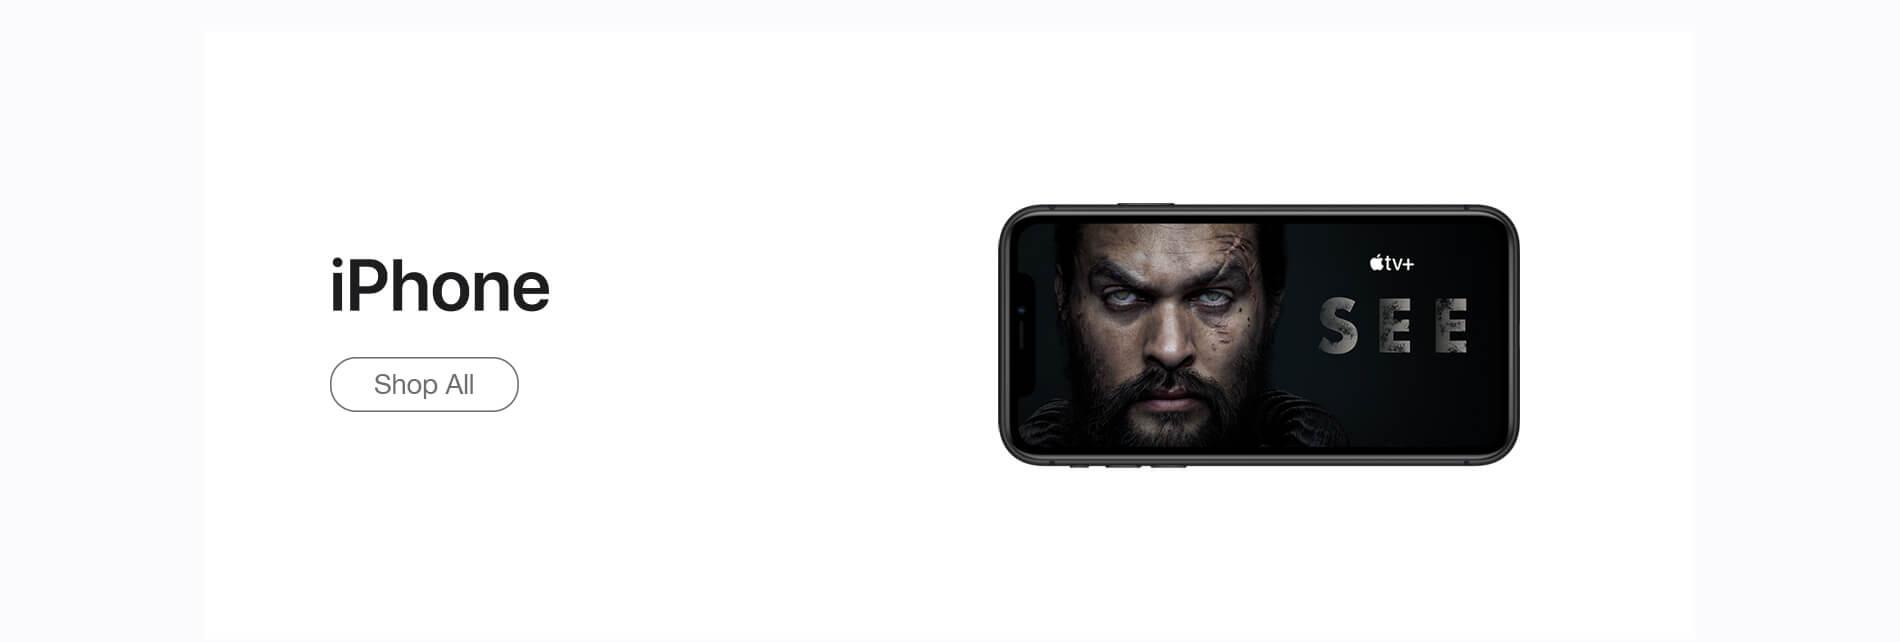 iPhone, Apple TV+